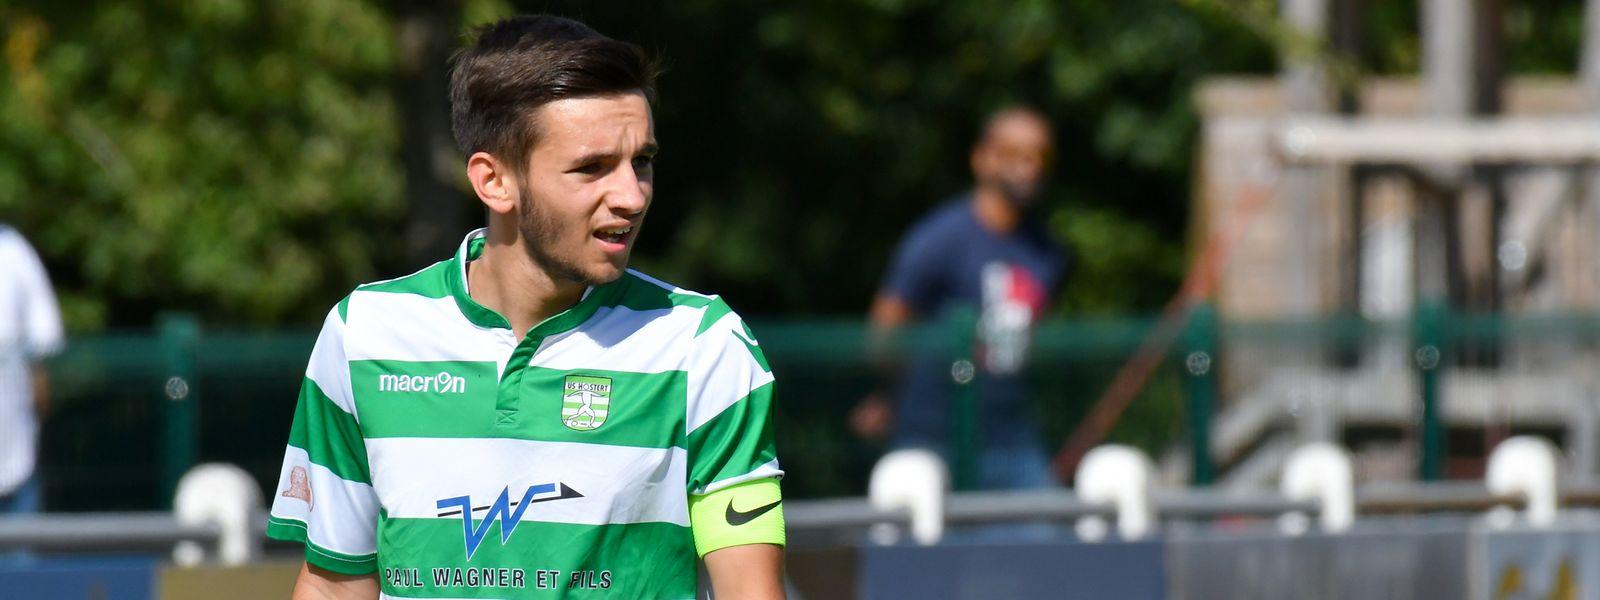 Tonangebend: Alexandre Sacras bekommt in den neuen Saison mehr Verantwortung.